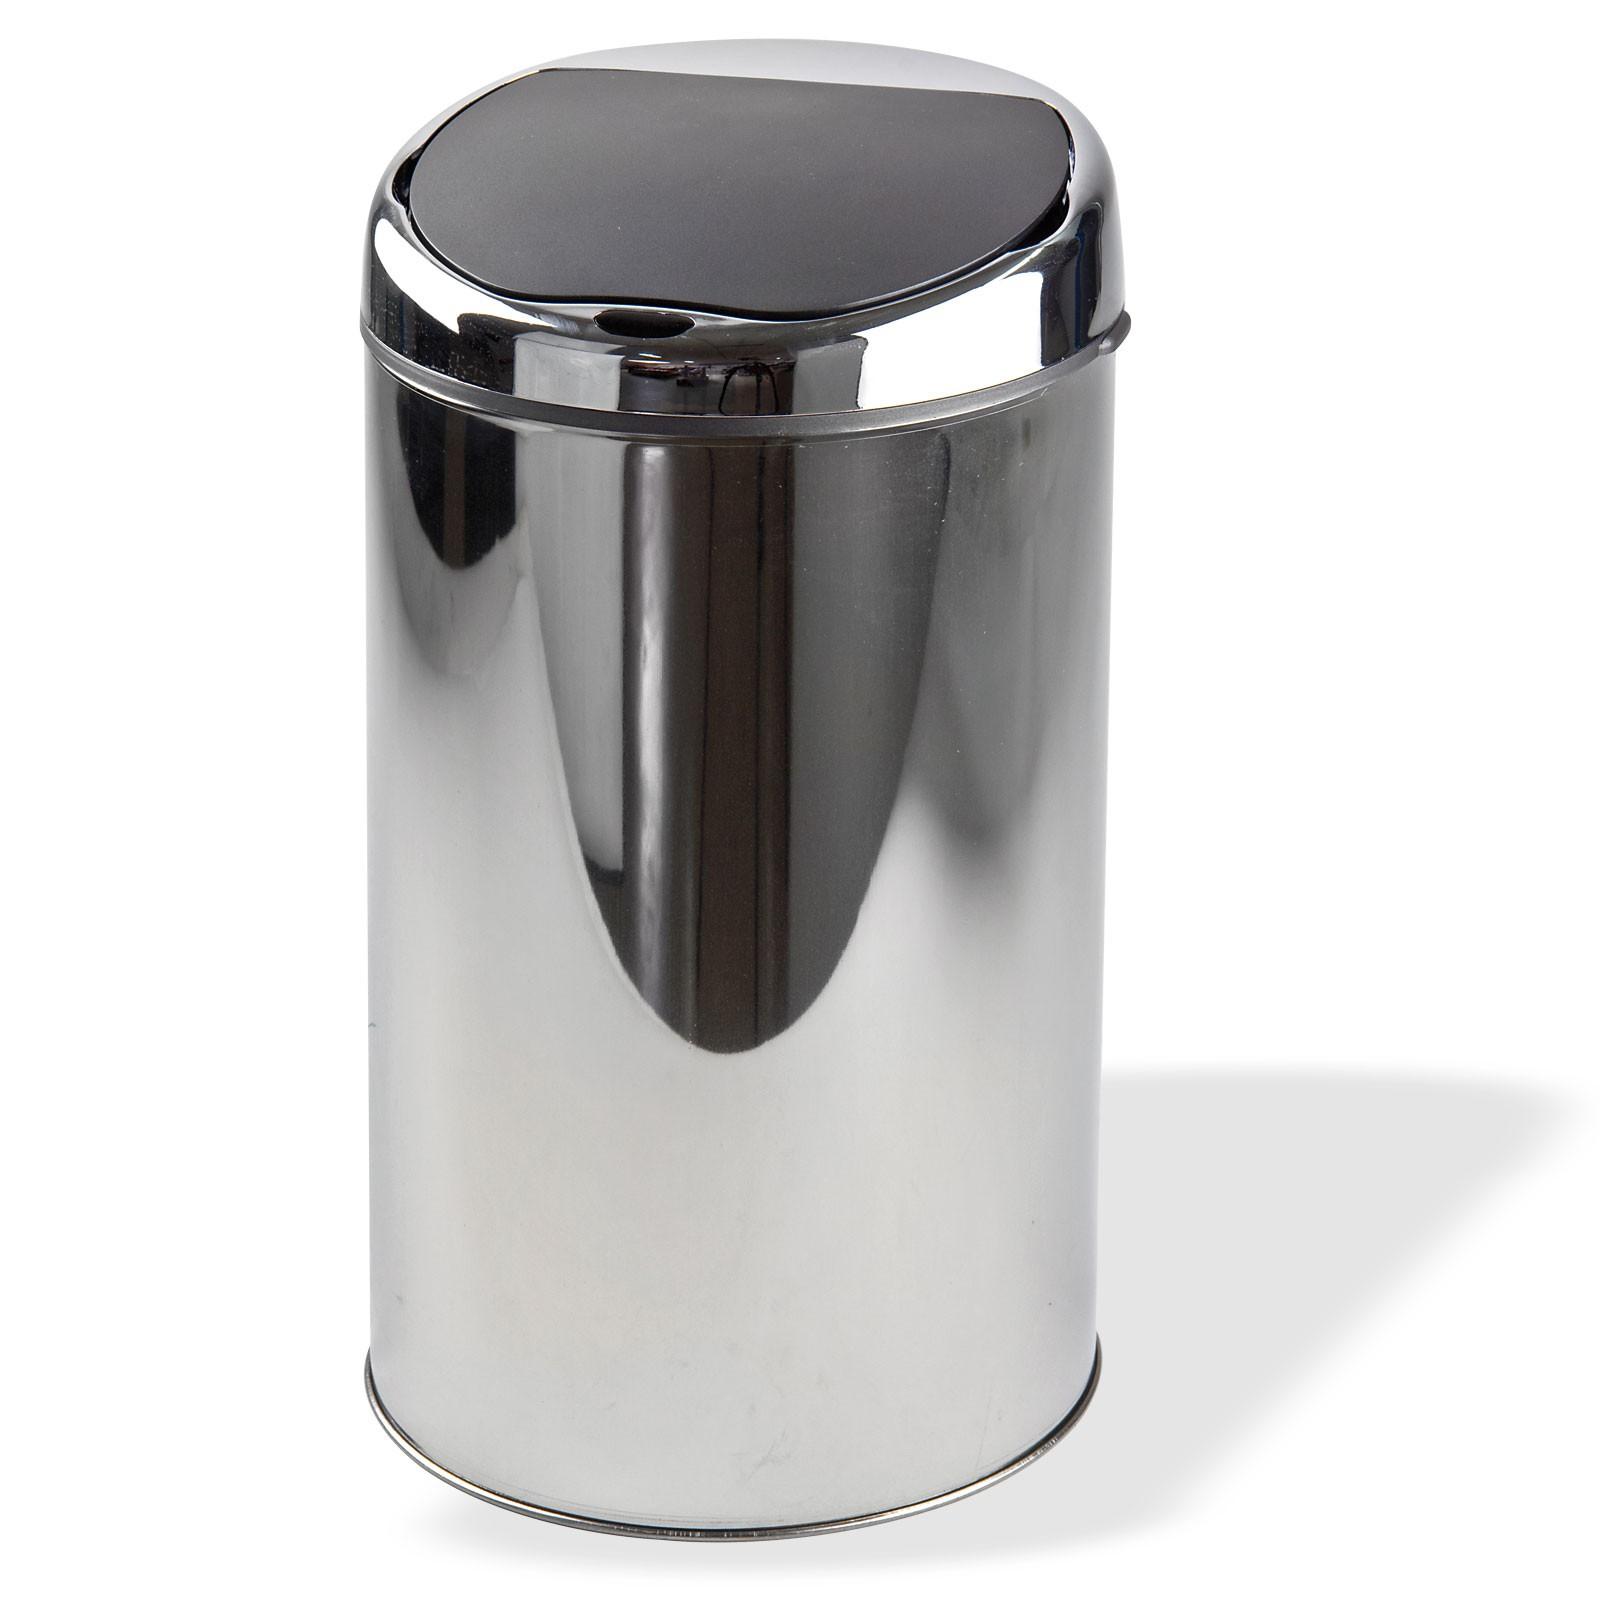 automatik m lleimer abfalleimer 6 liter mit sensor deckel. Black Bedroom Furniture Sets. Home Design Ideas